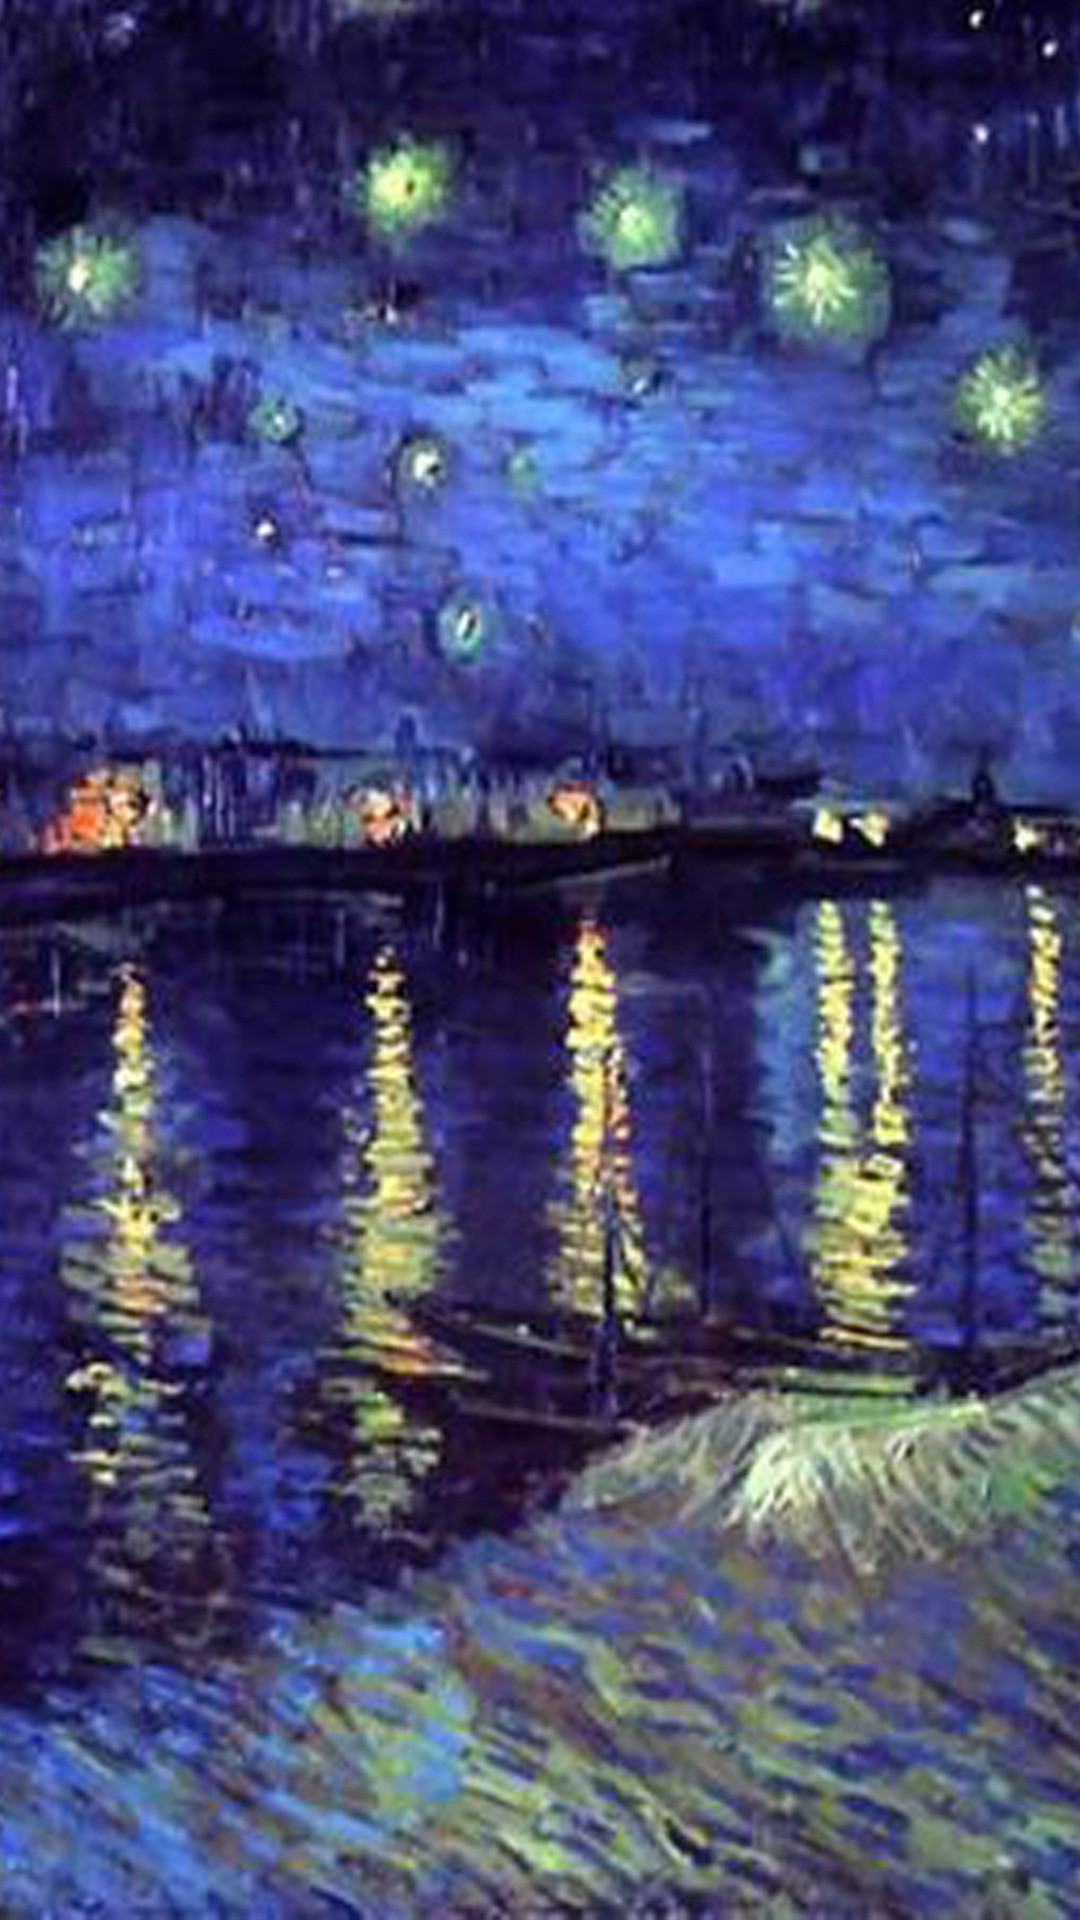 Res: 1080x1920, • hippie vintage indie Grunge pastel backgrounds Van Gogh pale wallpapers  Hologram aesthetics outlines overlays Transparents lockscreens van gogh ...